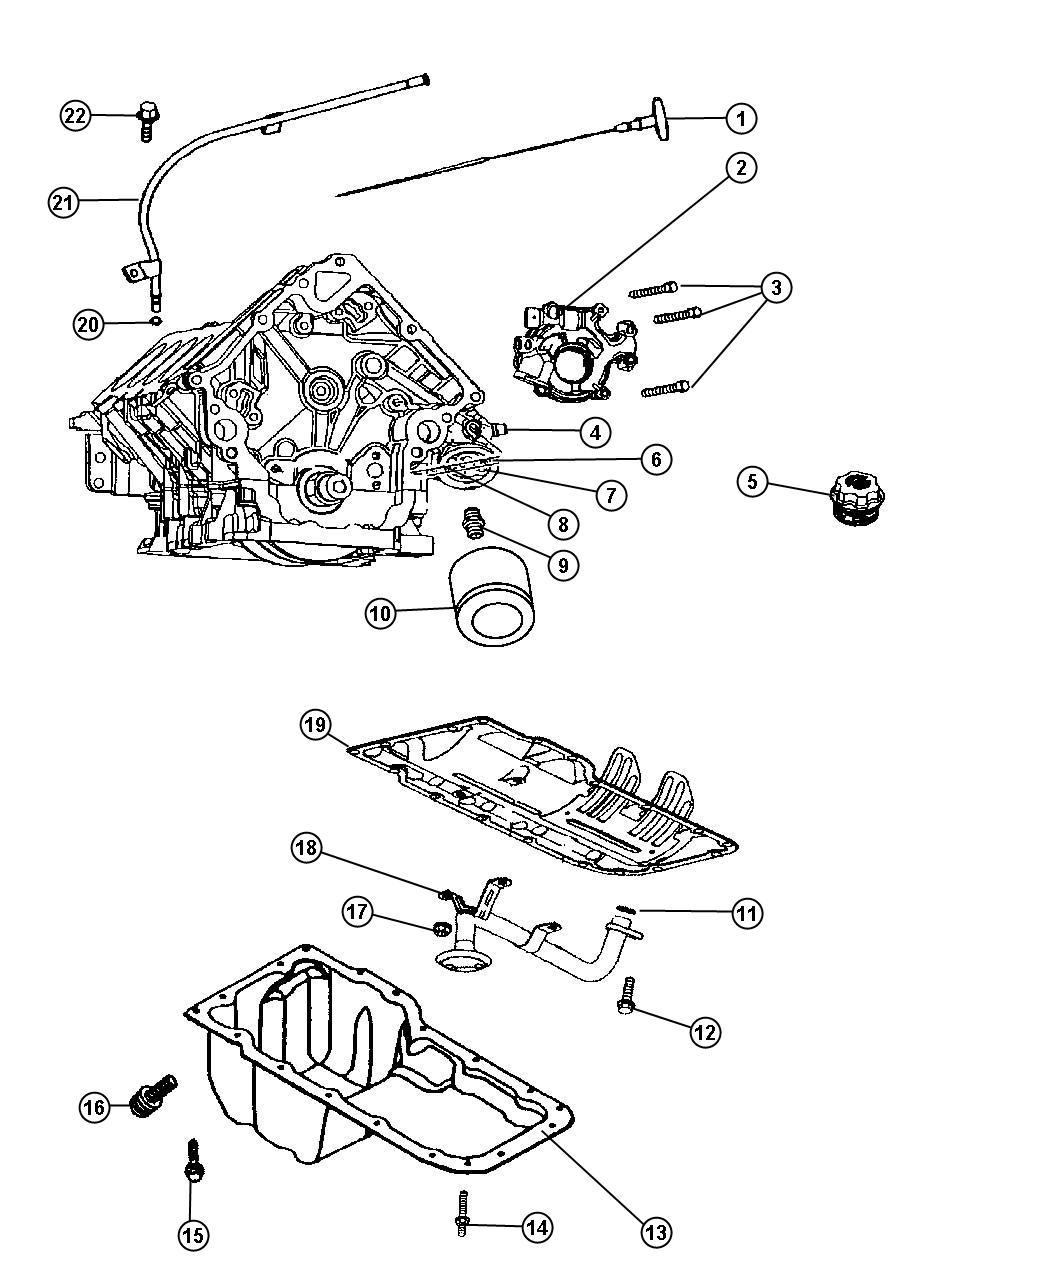 Dodge Ram Adapter Connector Oil Filter Oil Filter